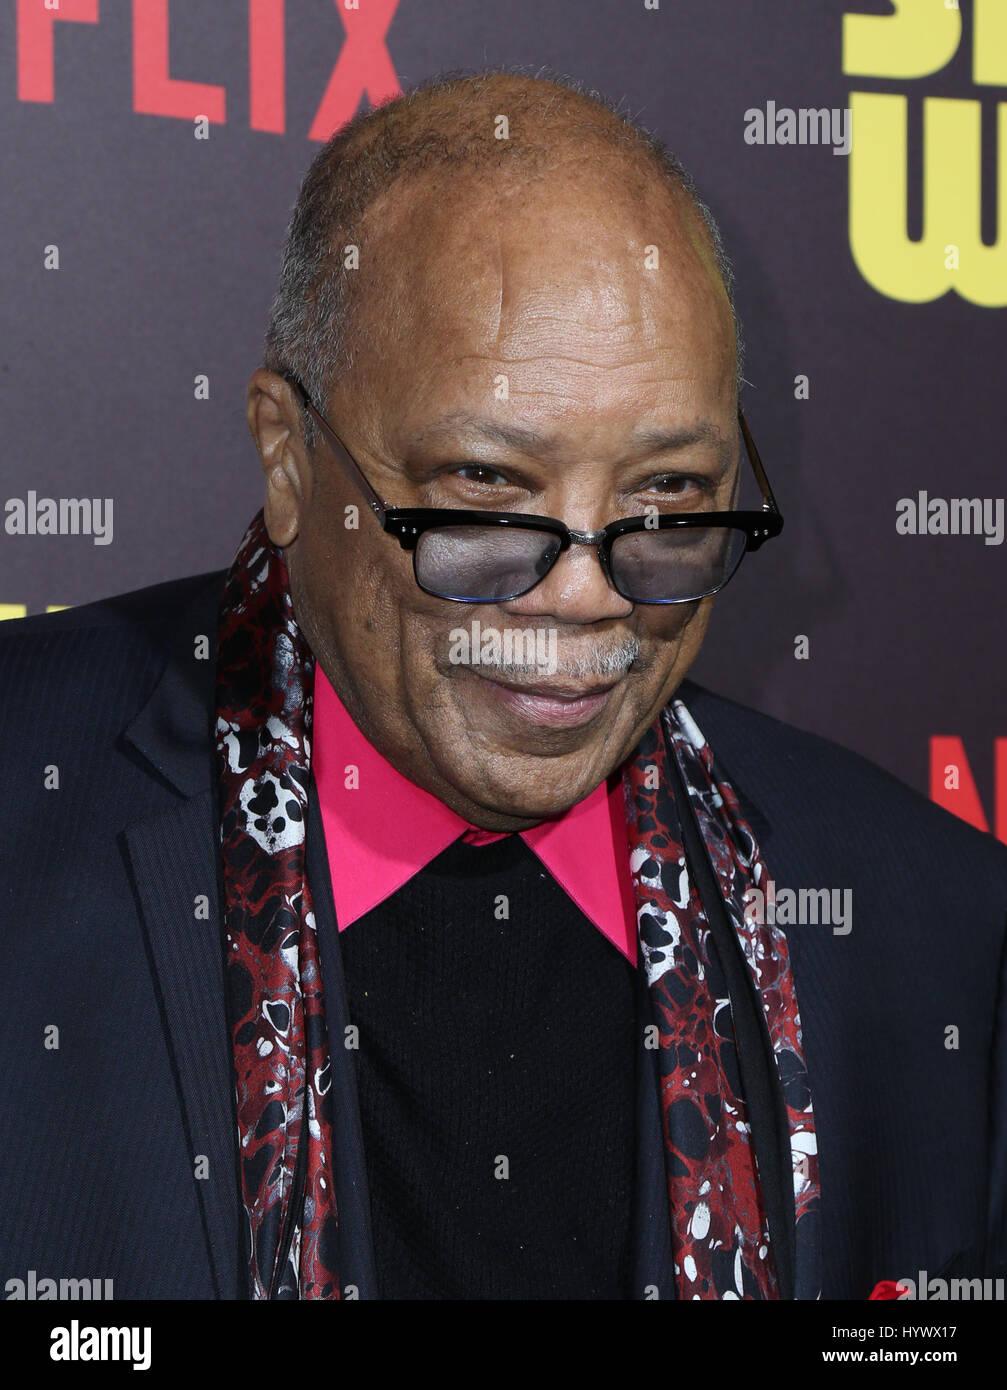 Los Angeles, USA. 6th Apr, 2017. Quincy Jones, the premiere of Netflix's 'Sandy Wexler'. Photo Credit: - Stock Image